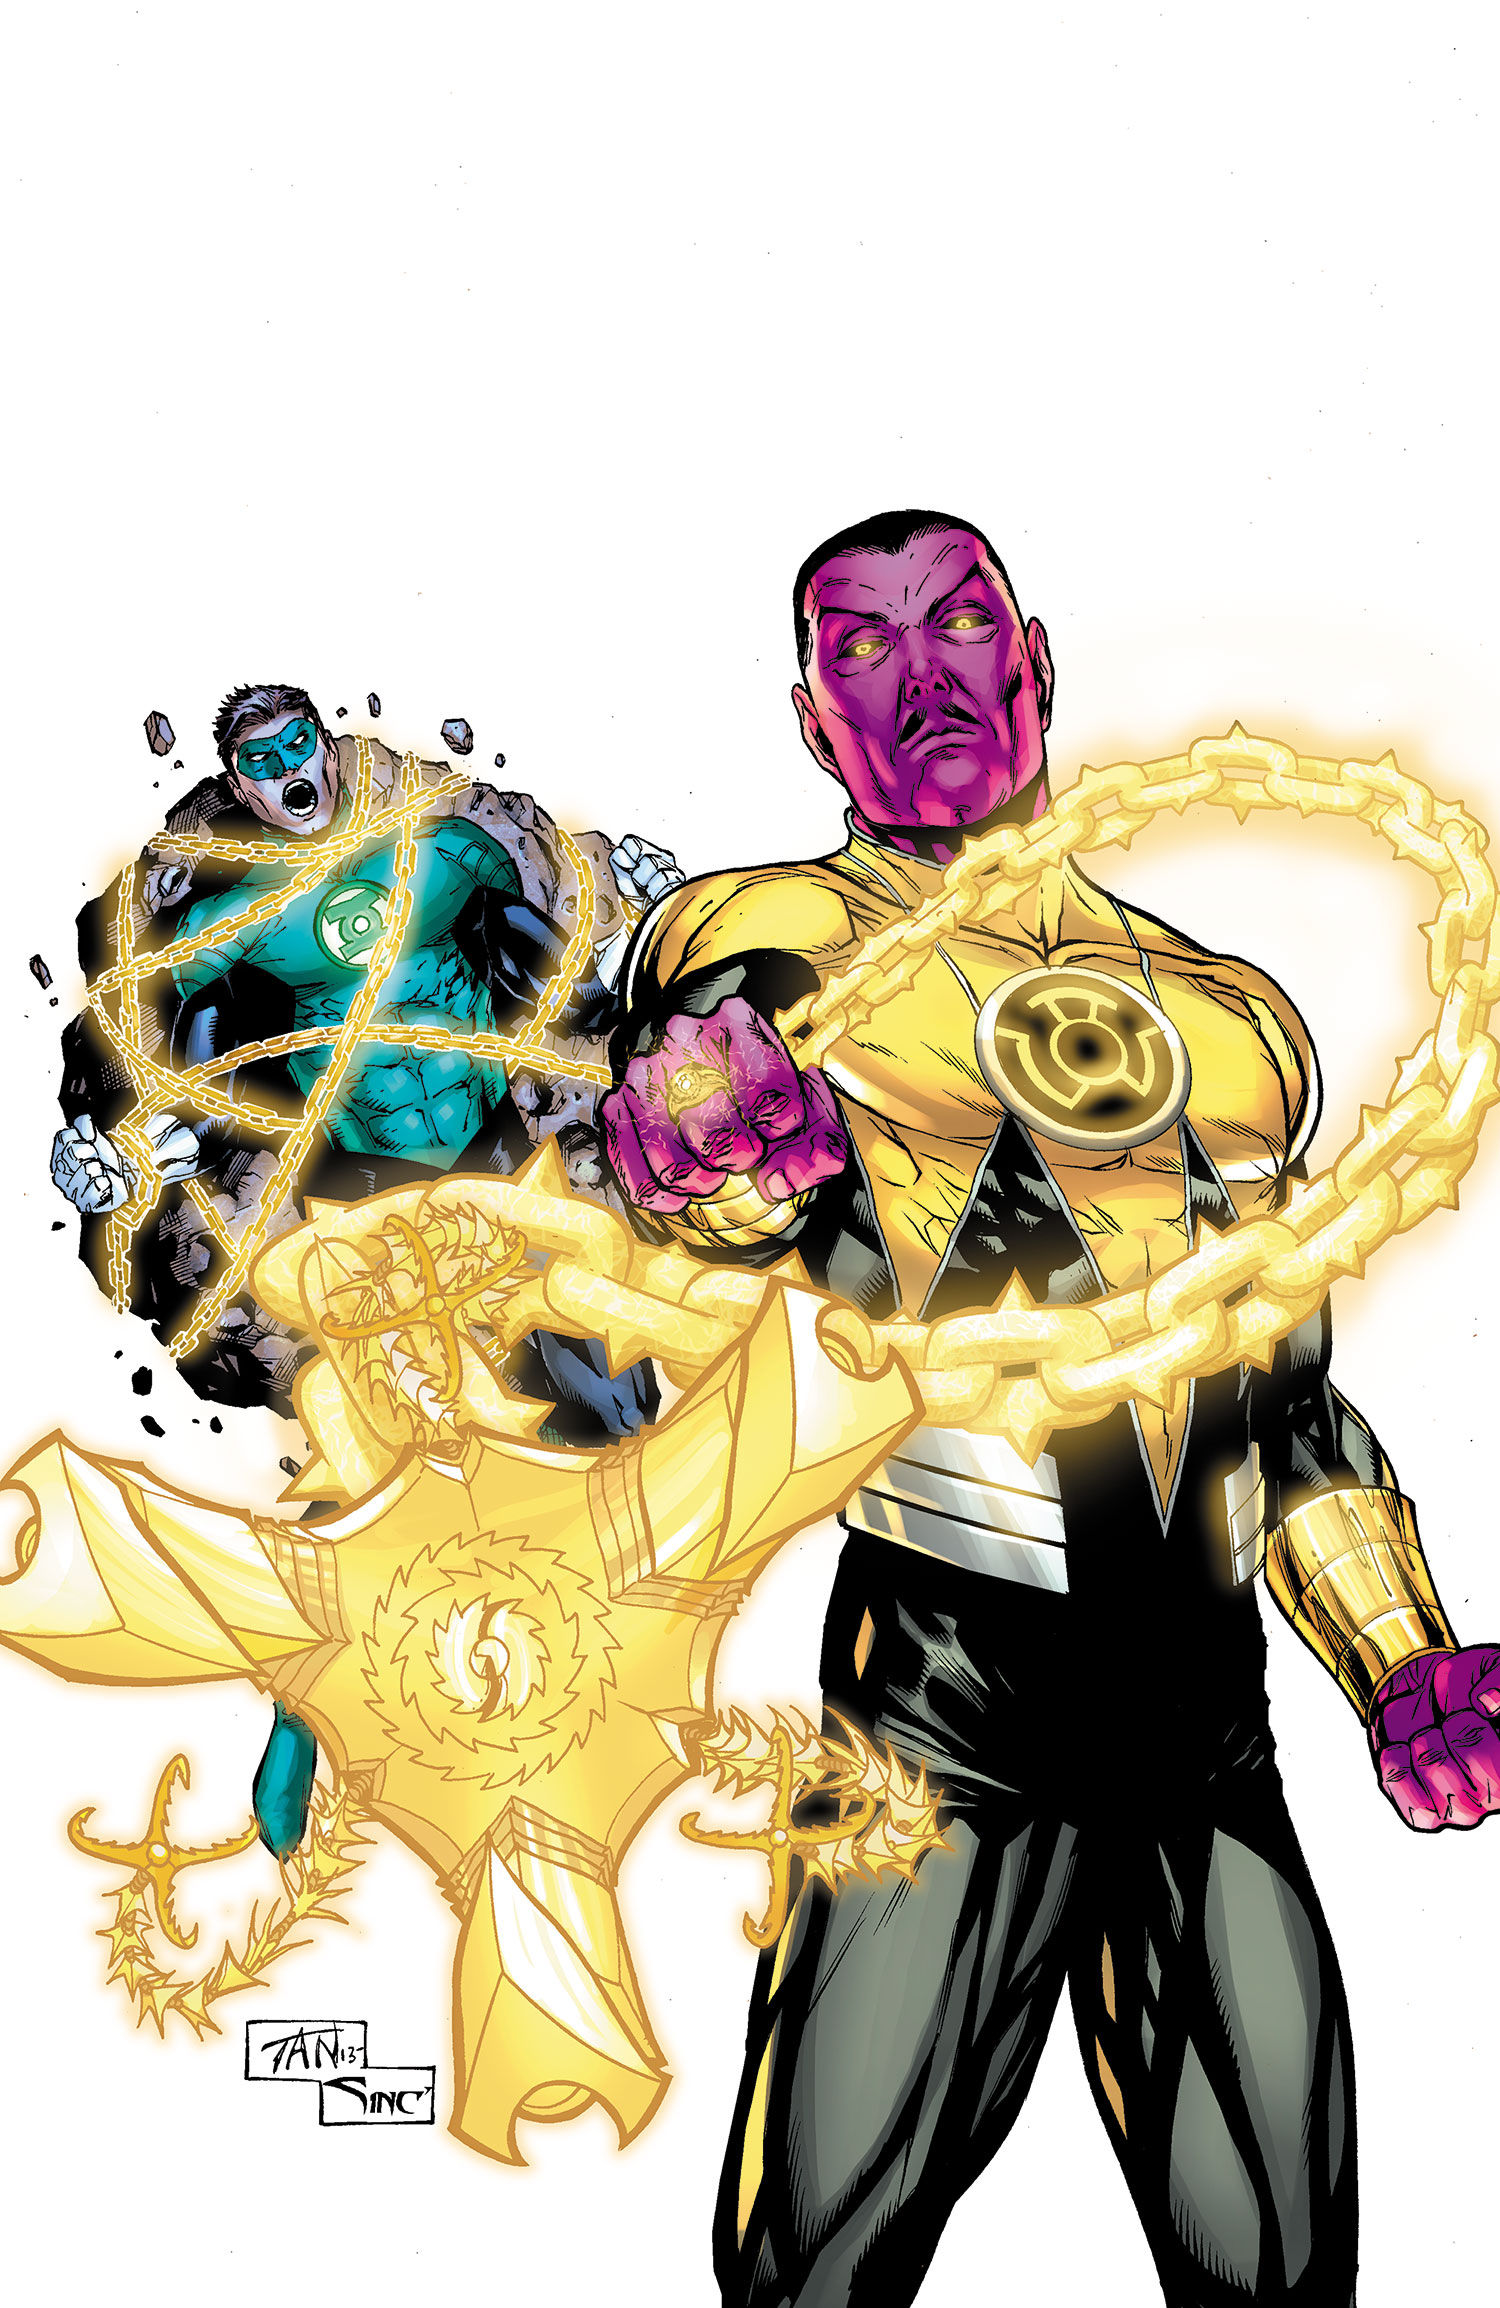 Green Lantern Vol 5 23.4 Sinestro Textless.jpg